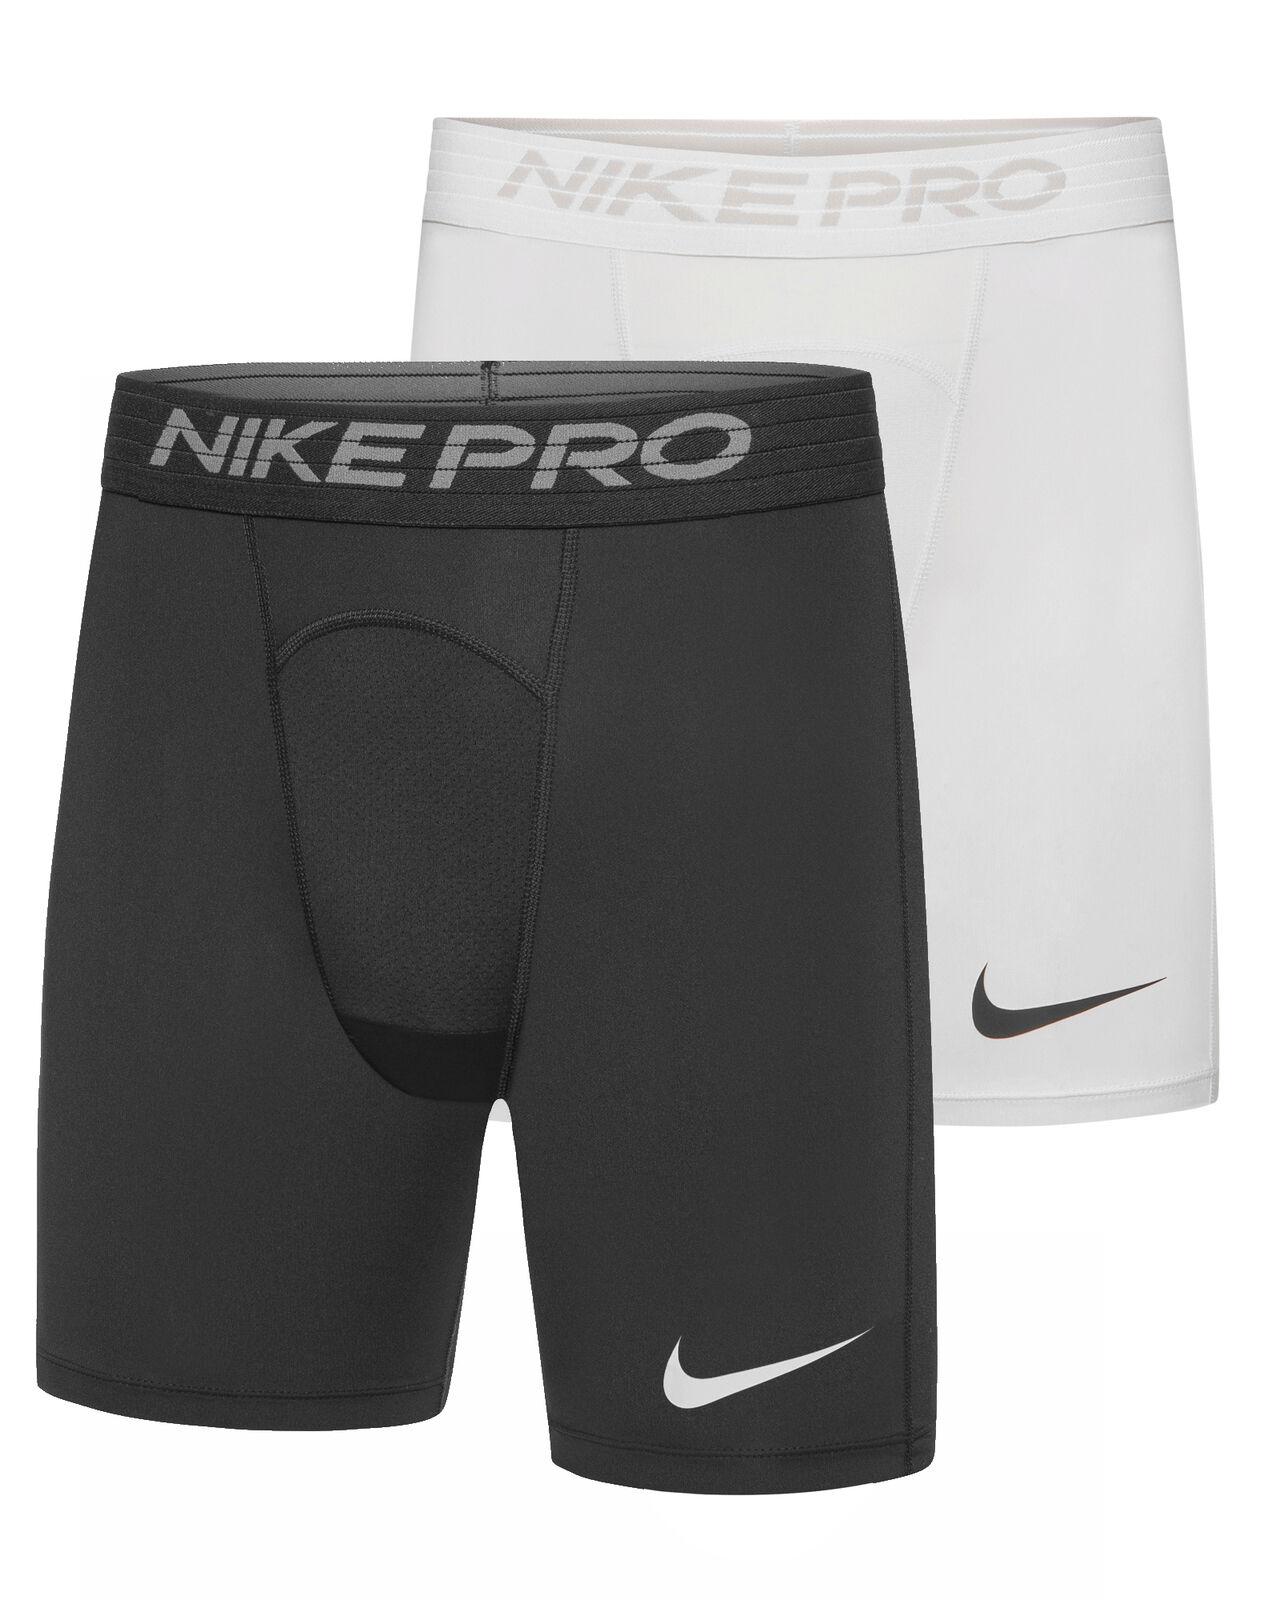 Nike Pro Herren Shorts - kurze Sporthose Dry Fit BV5635 Training Kompression NEU